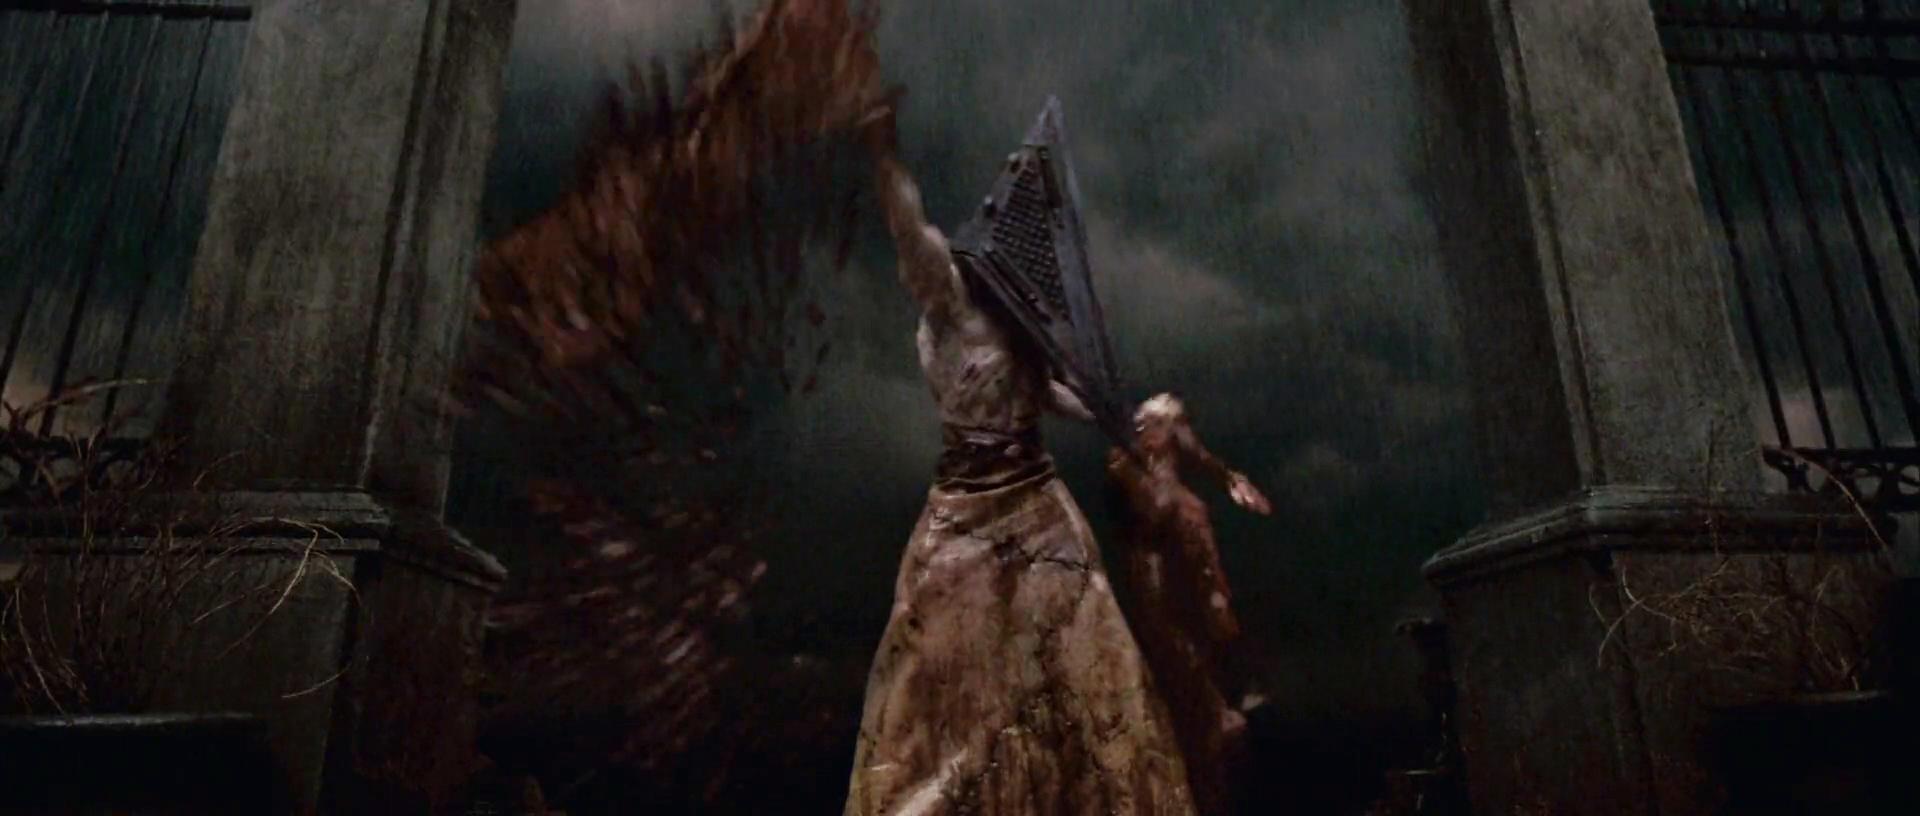 silent hill movie pyramid head scene